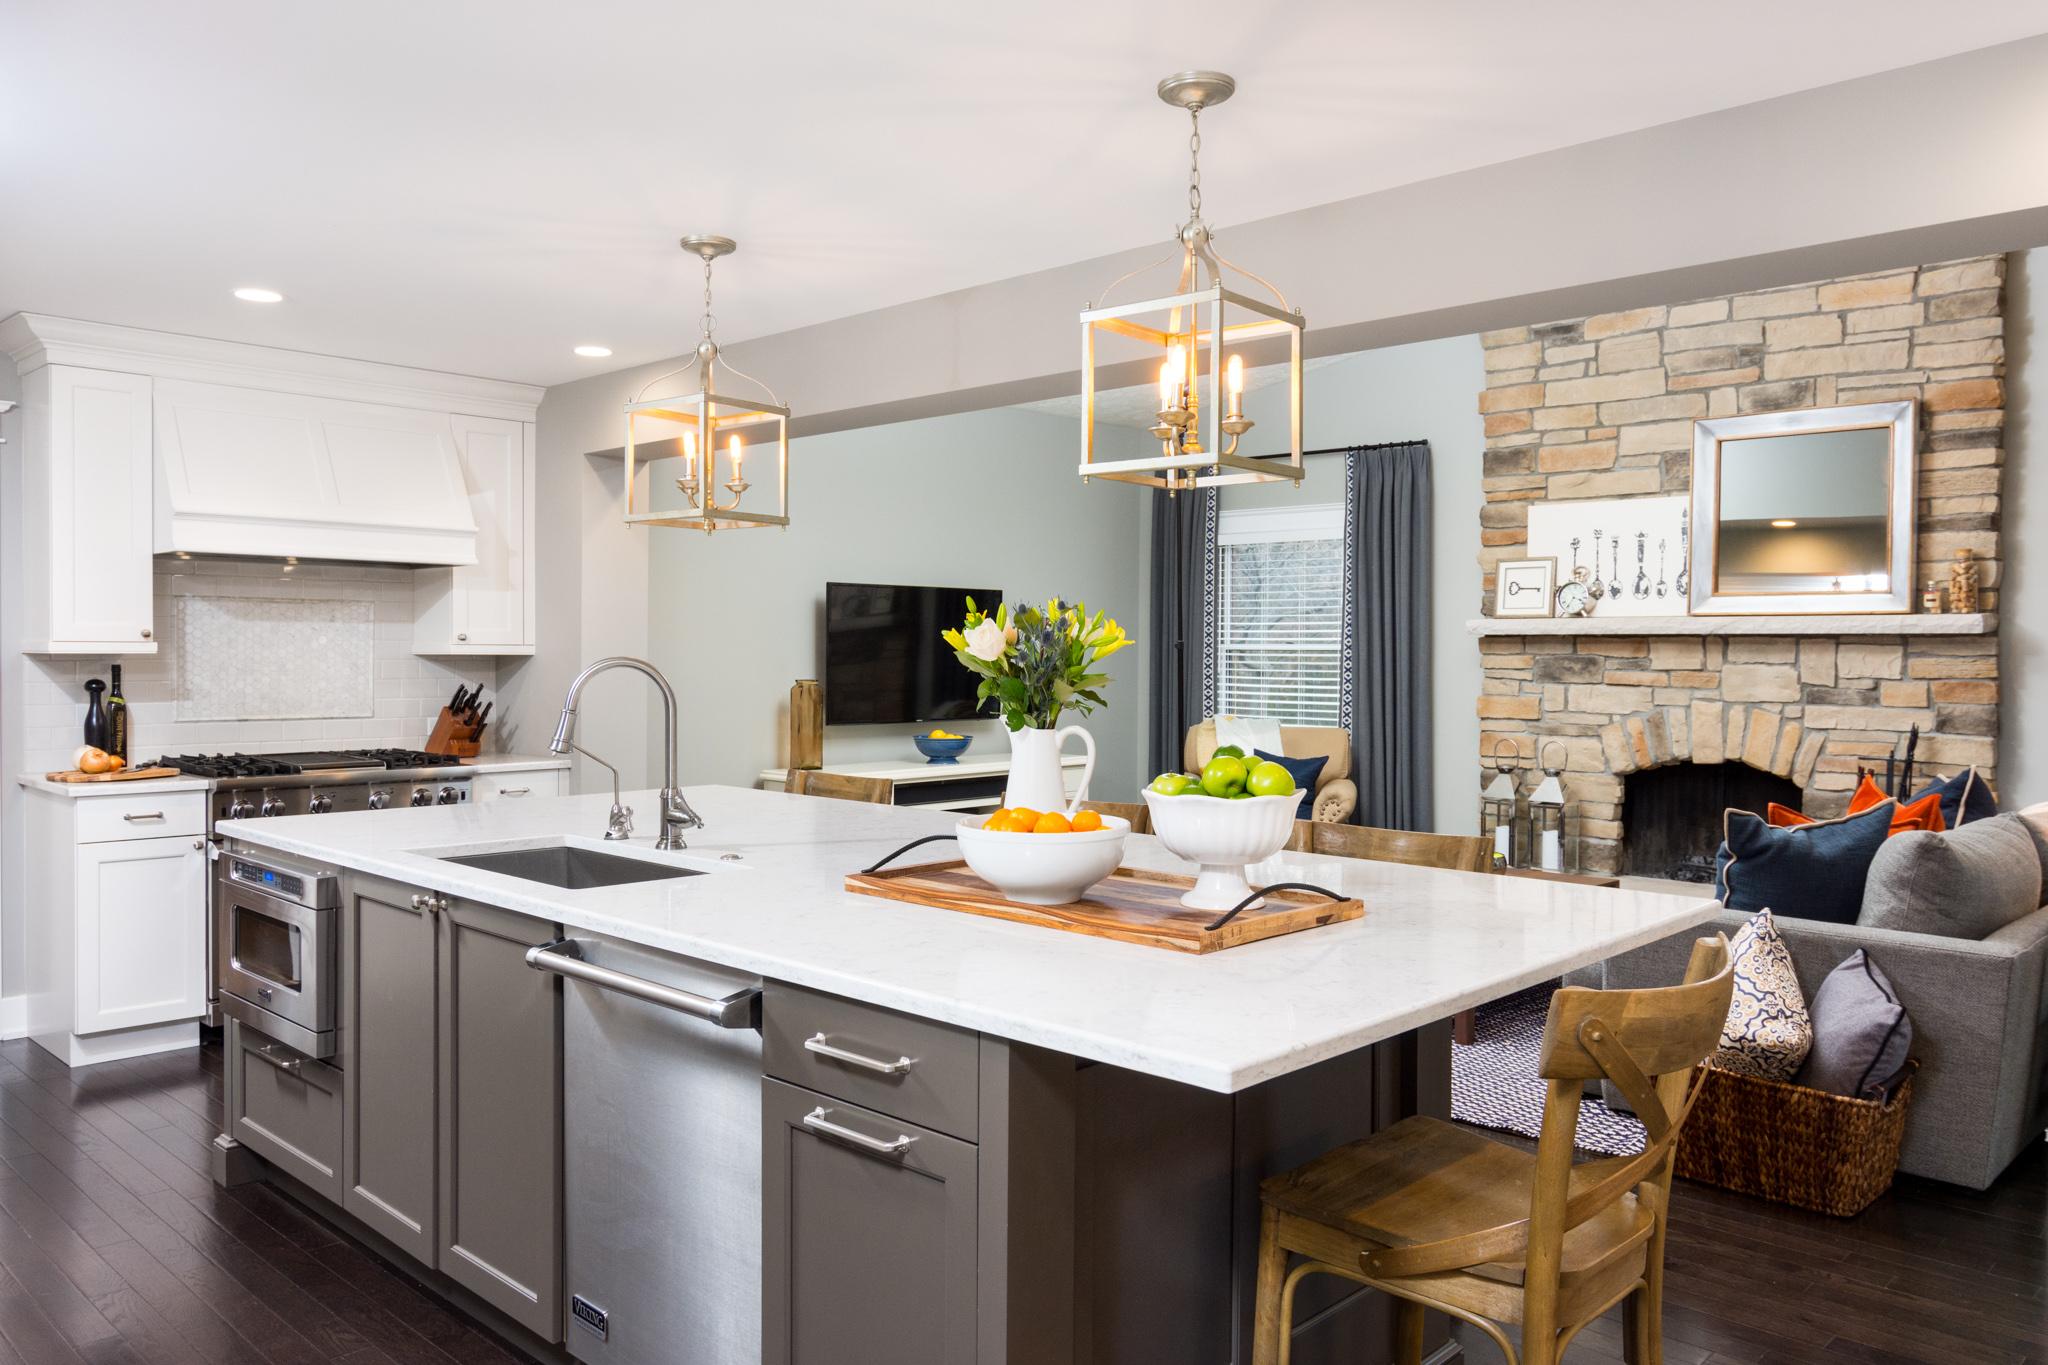 #10 3928 Warren Ct. Ann Arbor   Open Concept Kitchen Remodel